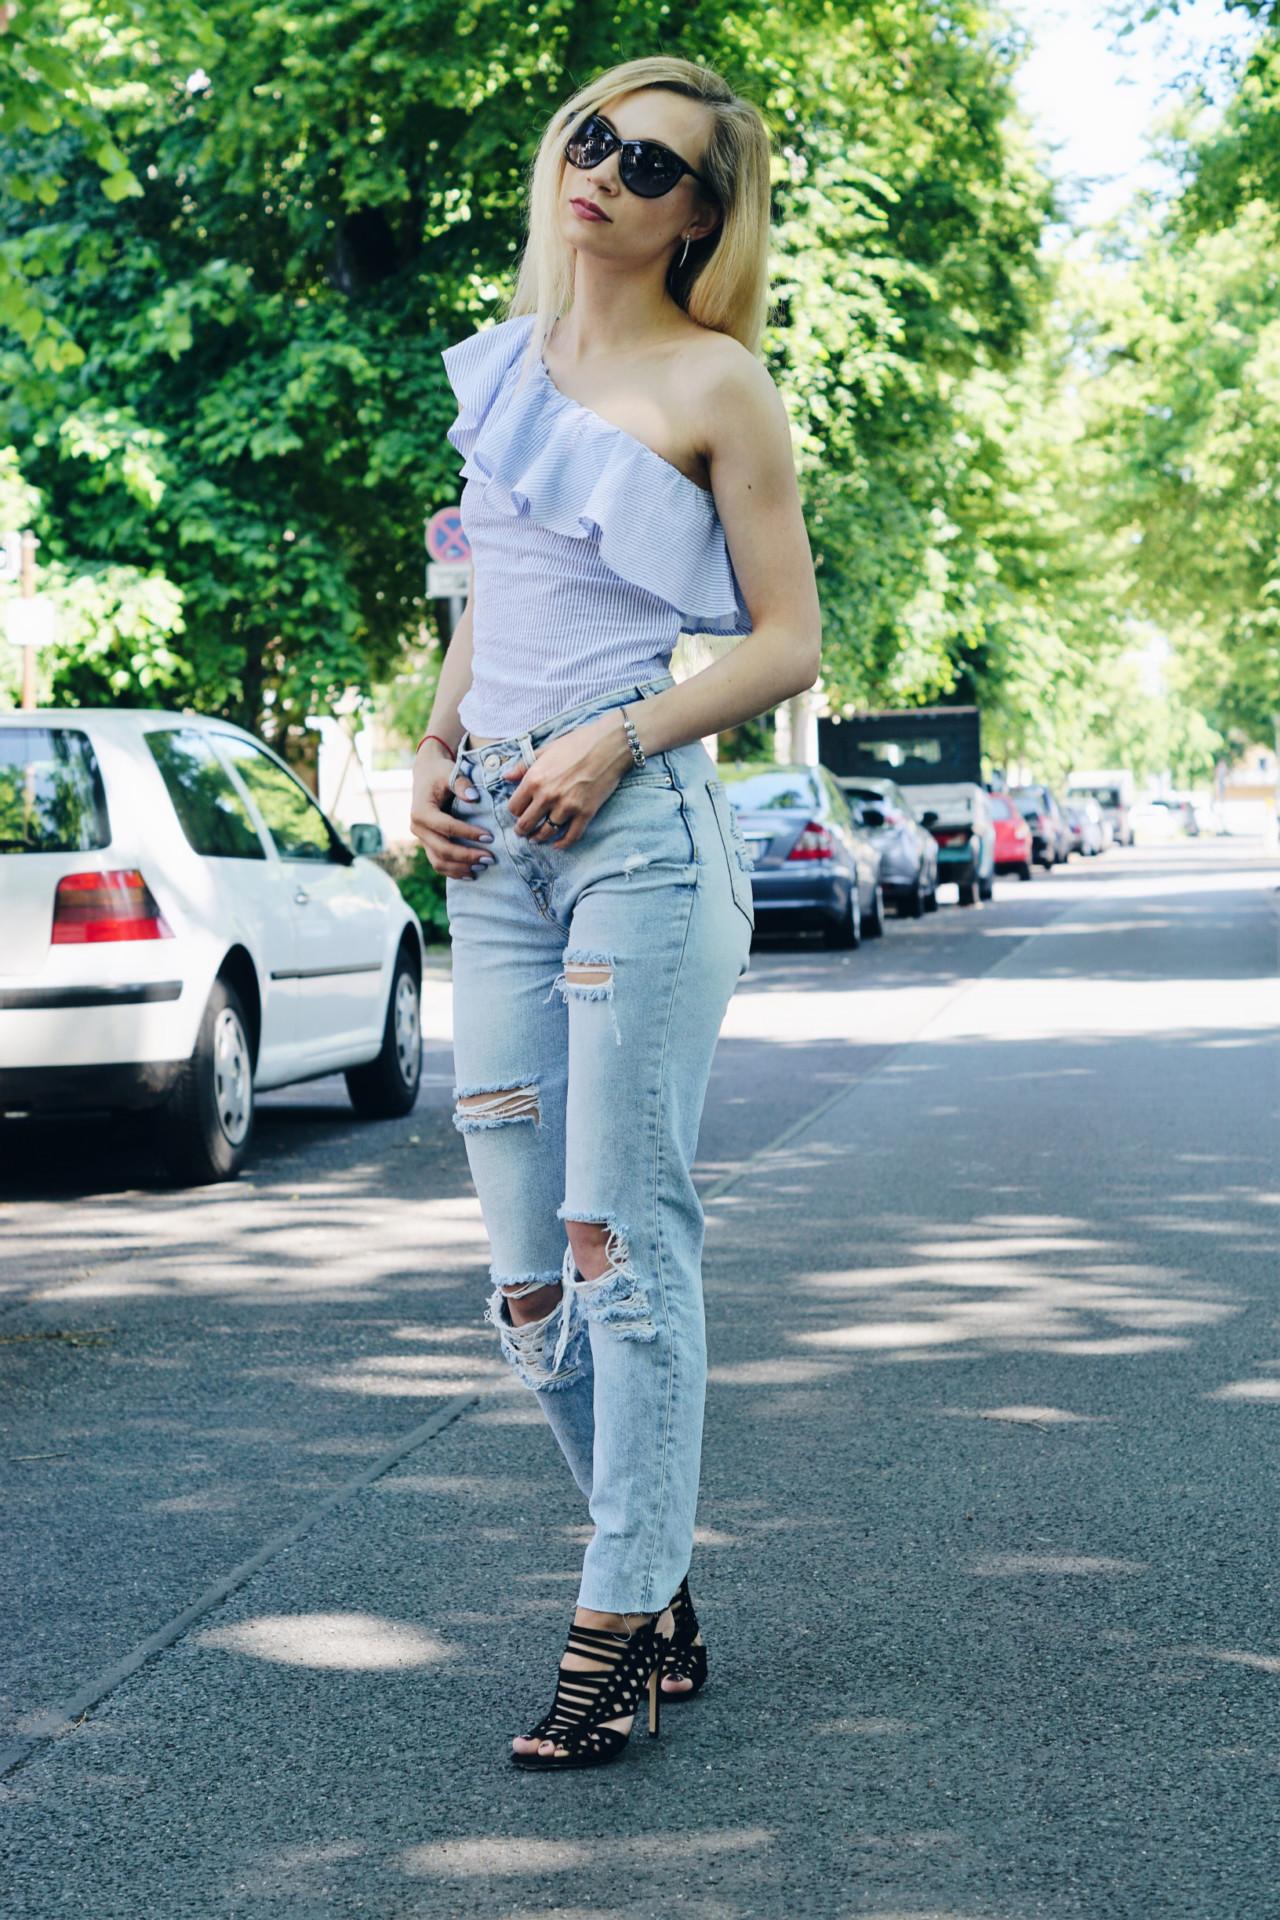 dbkstylez_streetstyle_mode_fashion_bestblog_fashionblog_outfit_bershka_мода_стиль_бершка_манго_стритстайл